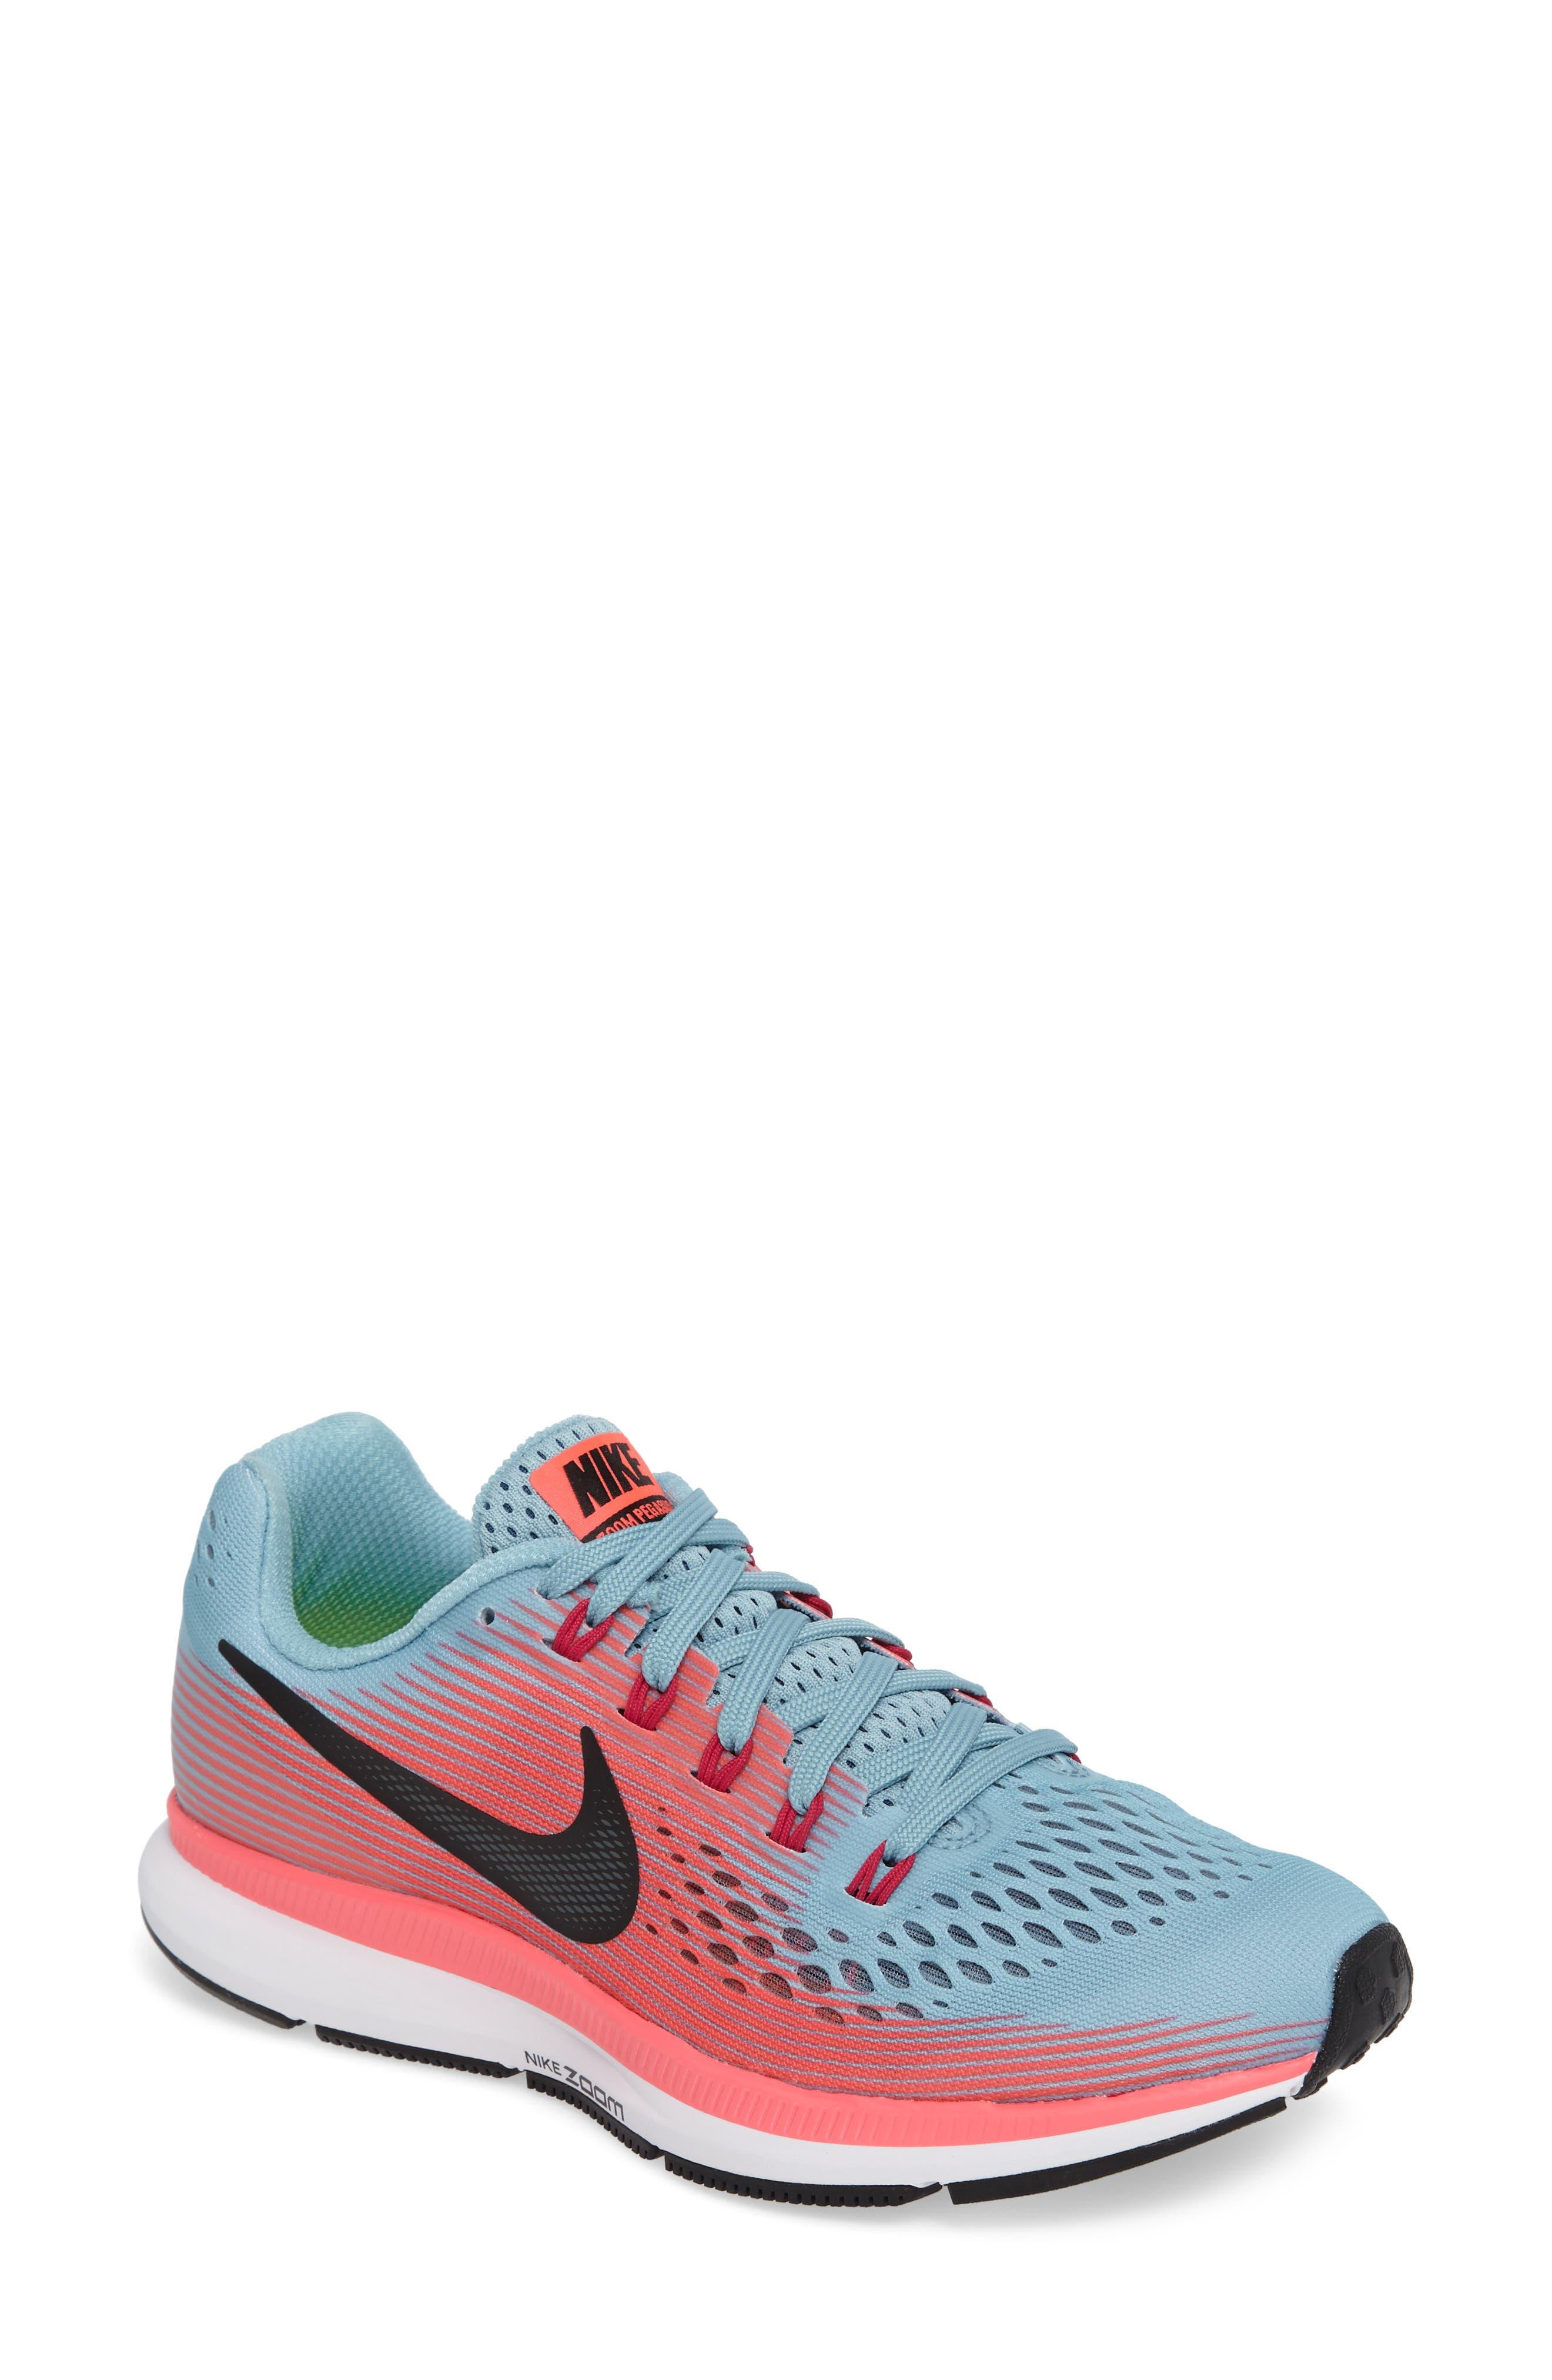 Air Zoom Pegasus 34 Running Shoe,                             Main thumbnail 1, color,                             Blue/ White/ Pink/ Fuchsia